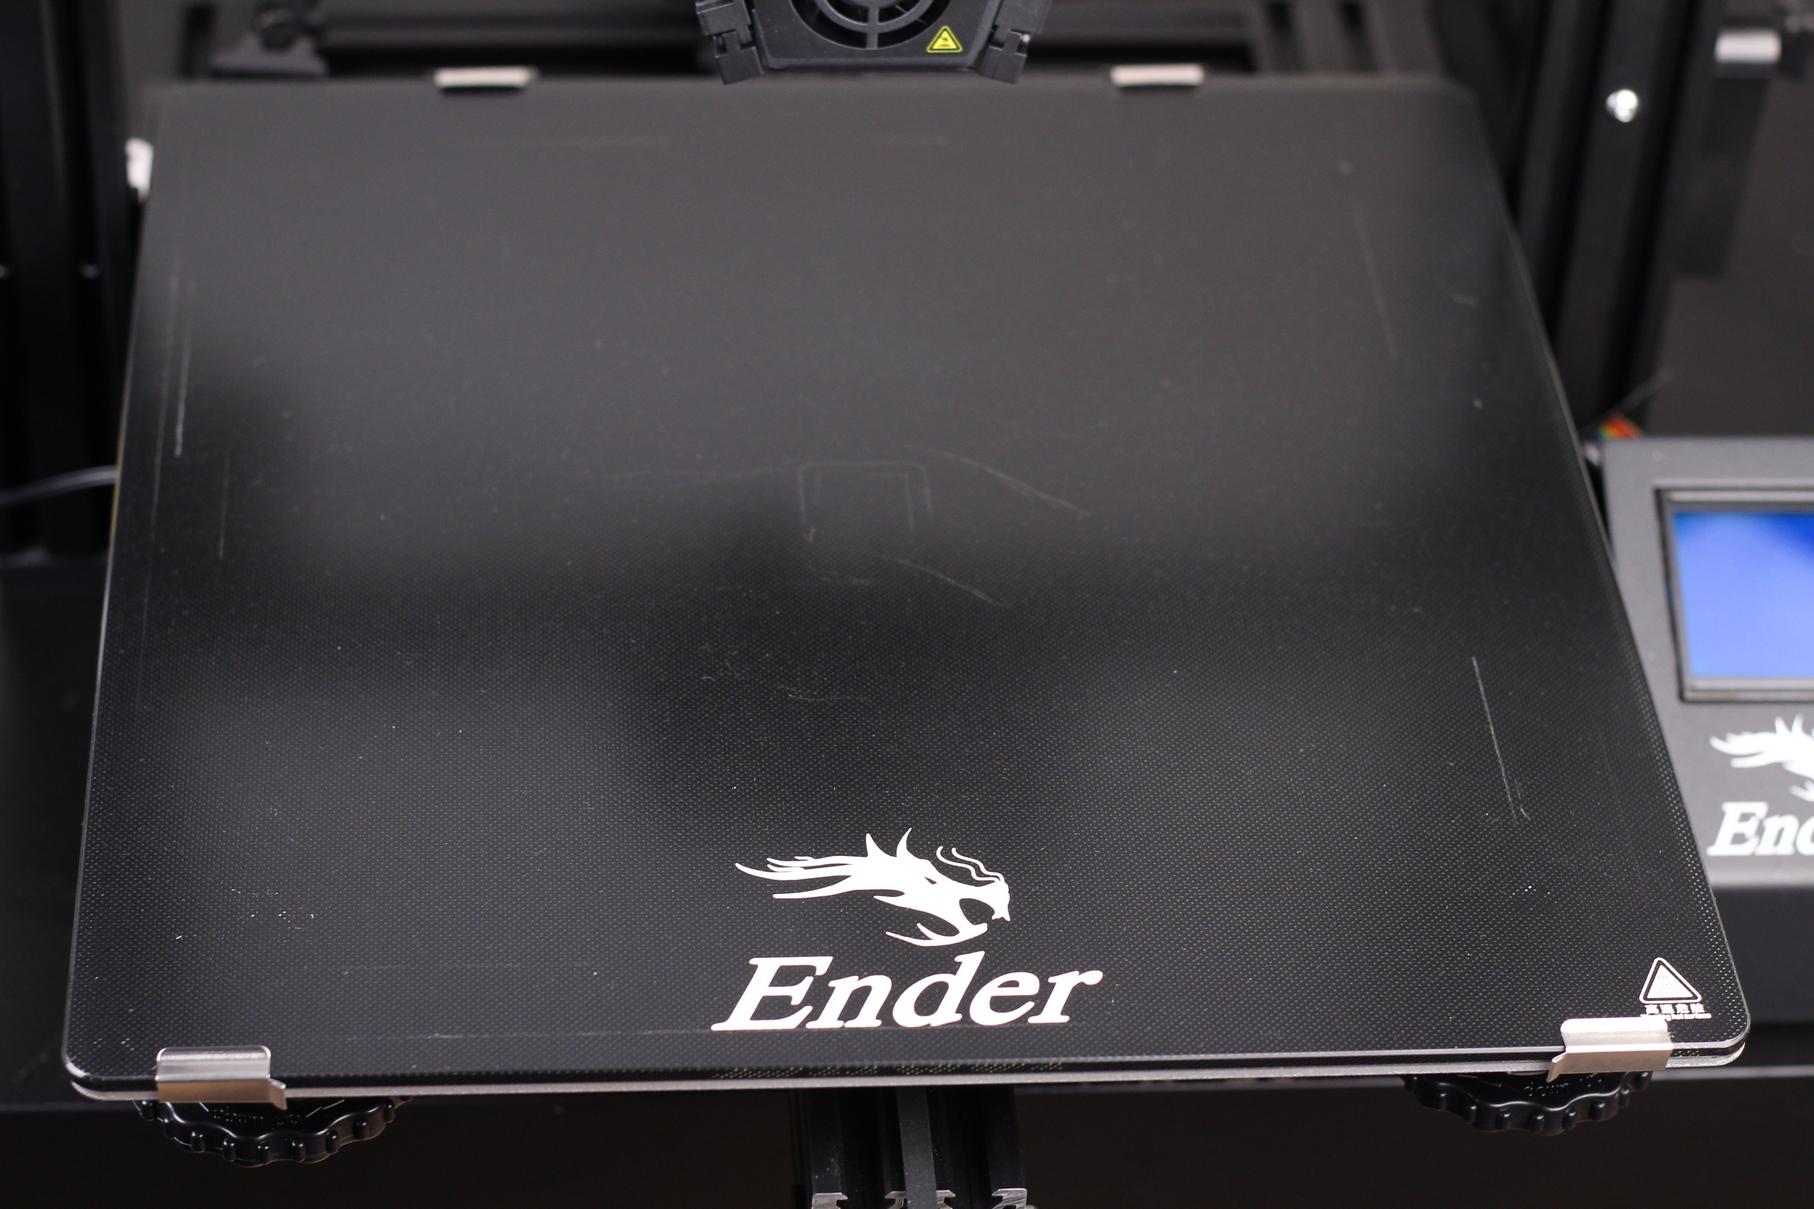 Ender-3-Max-Review-Carborundum-glass-print-surface-2